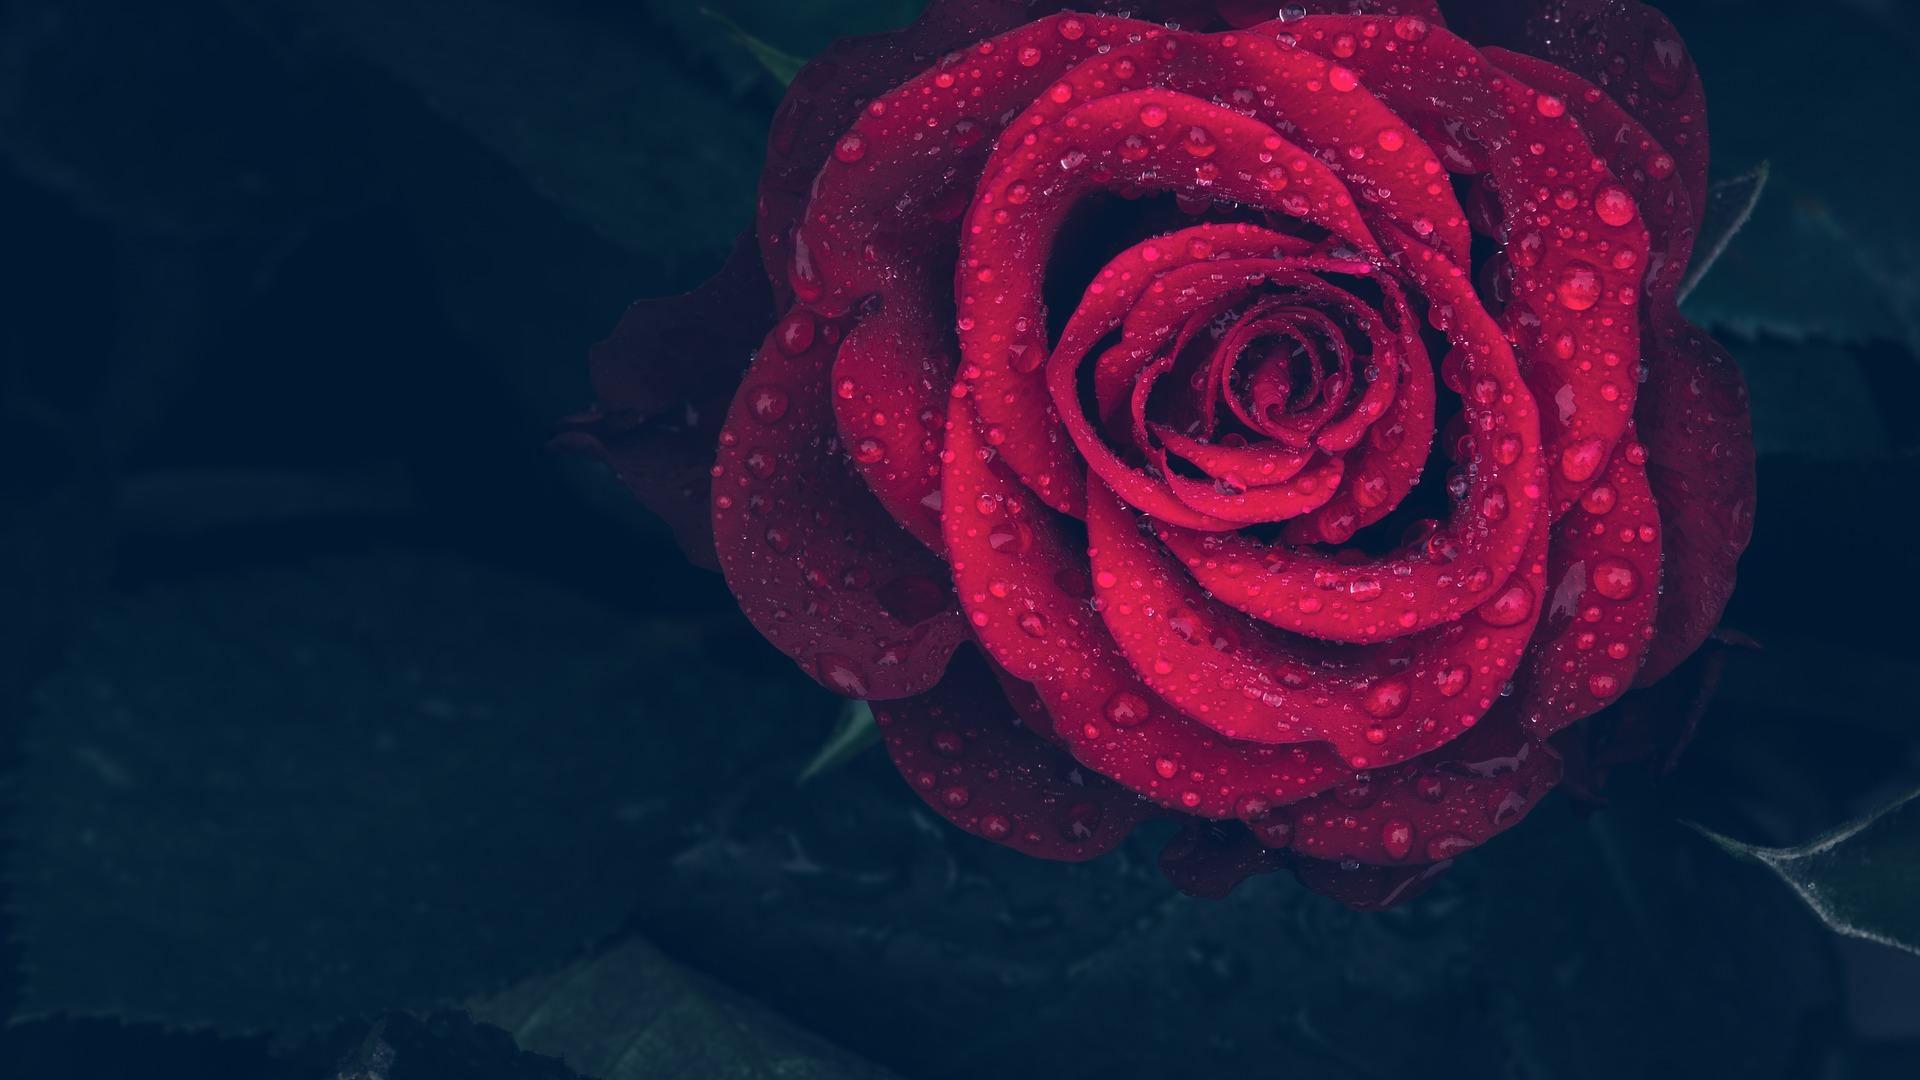 horoscop dragoste - sfatulparintilor.ro - pixabay_com - rose-3407234_1920